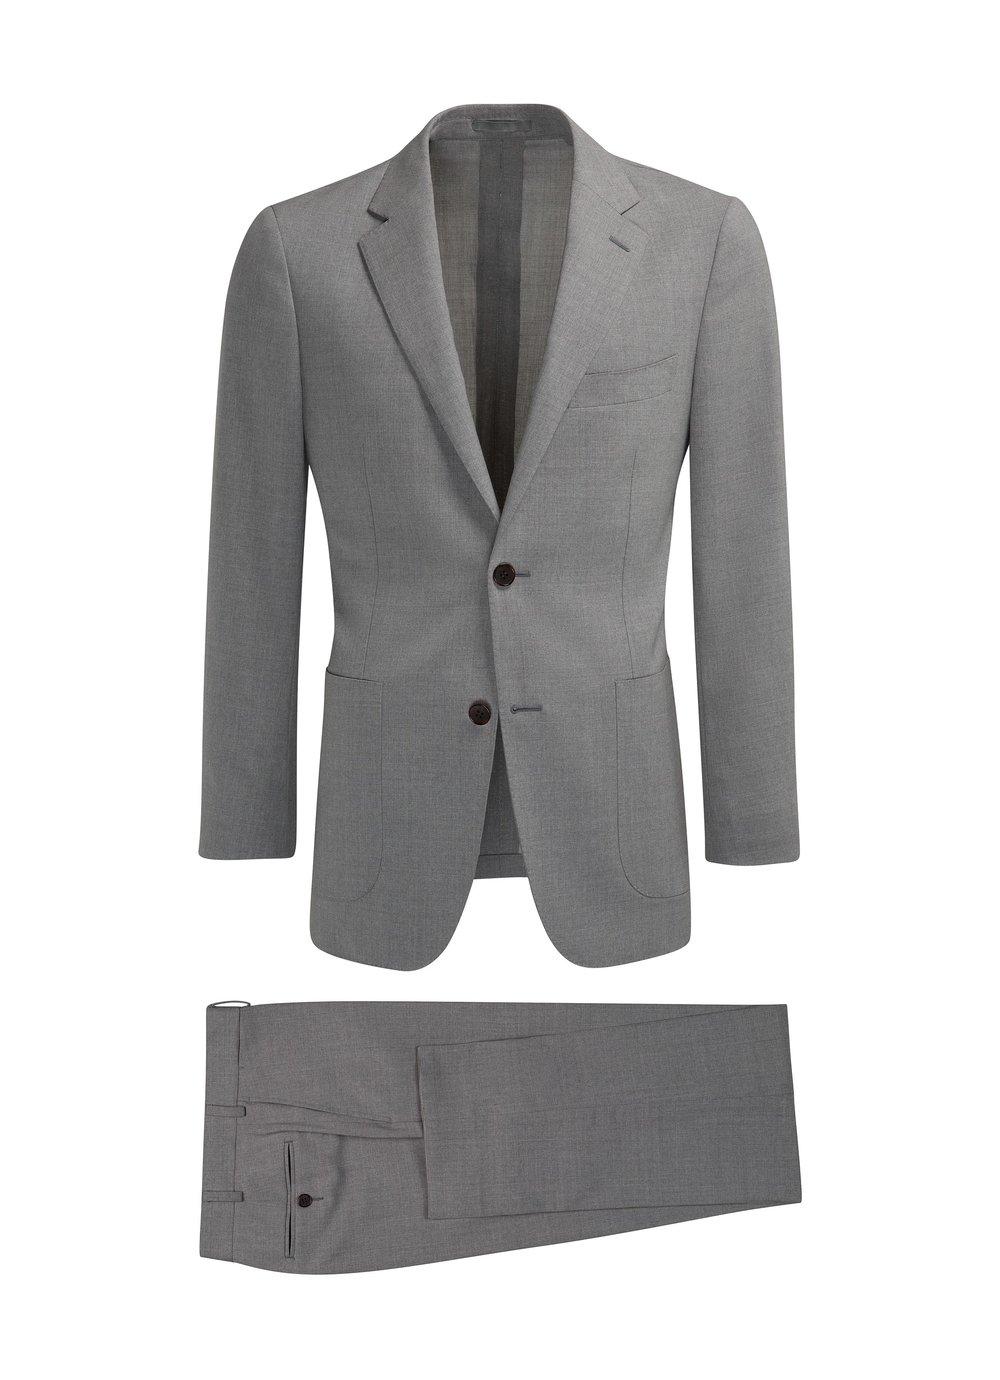 Suits_Light_Grey_Plain_Havana_Traveler_Unlined_P5184_Suitsupply_Online_Store_5.jpg